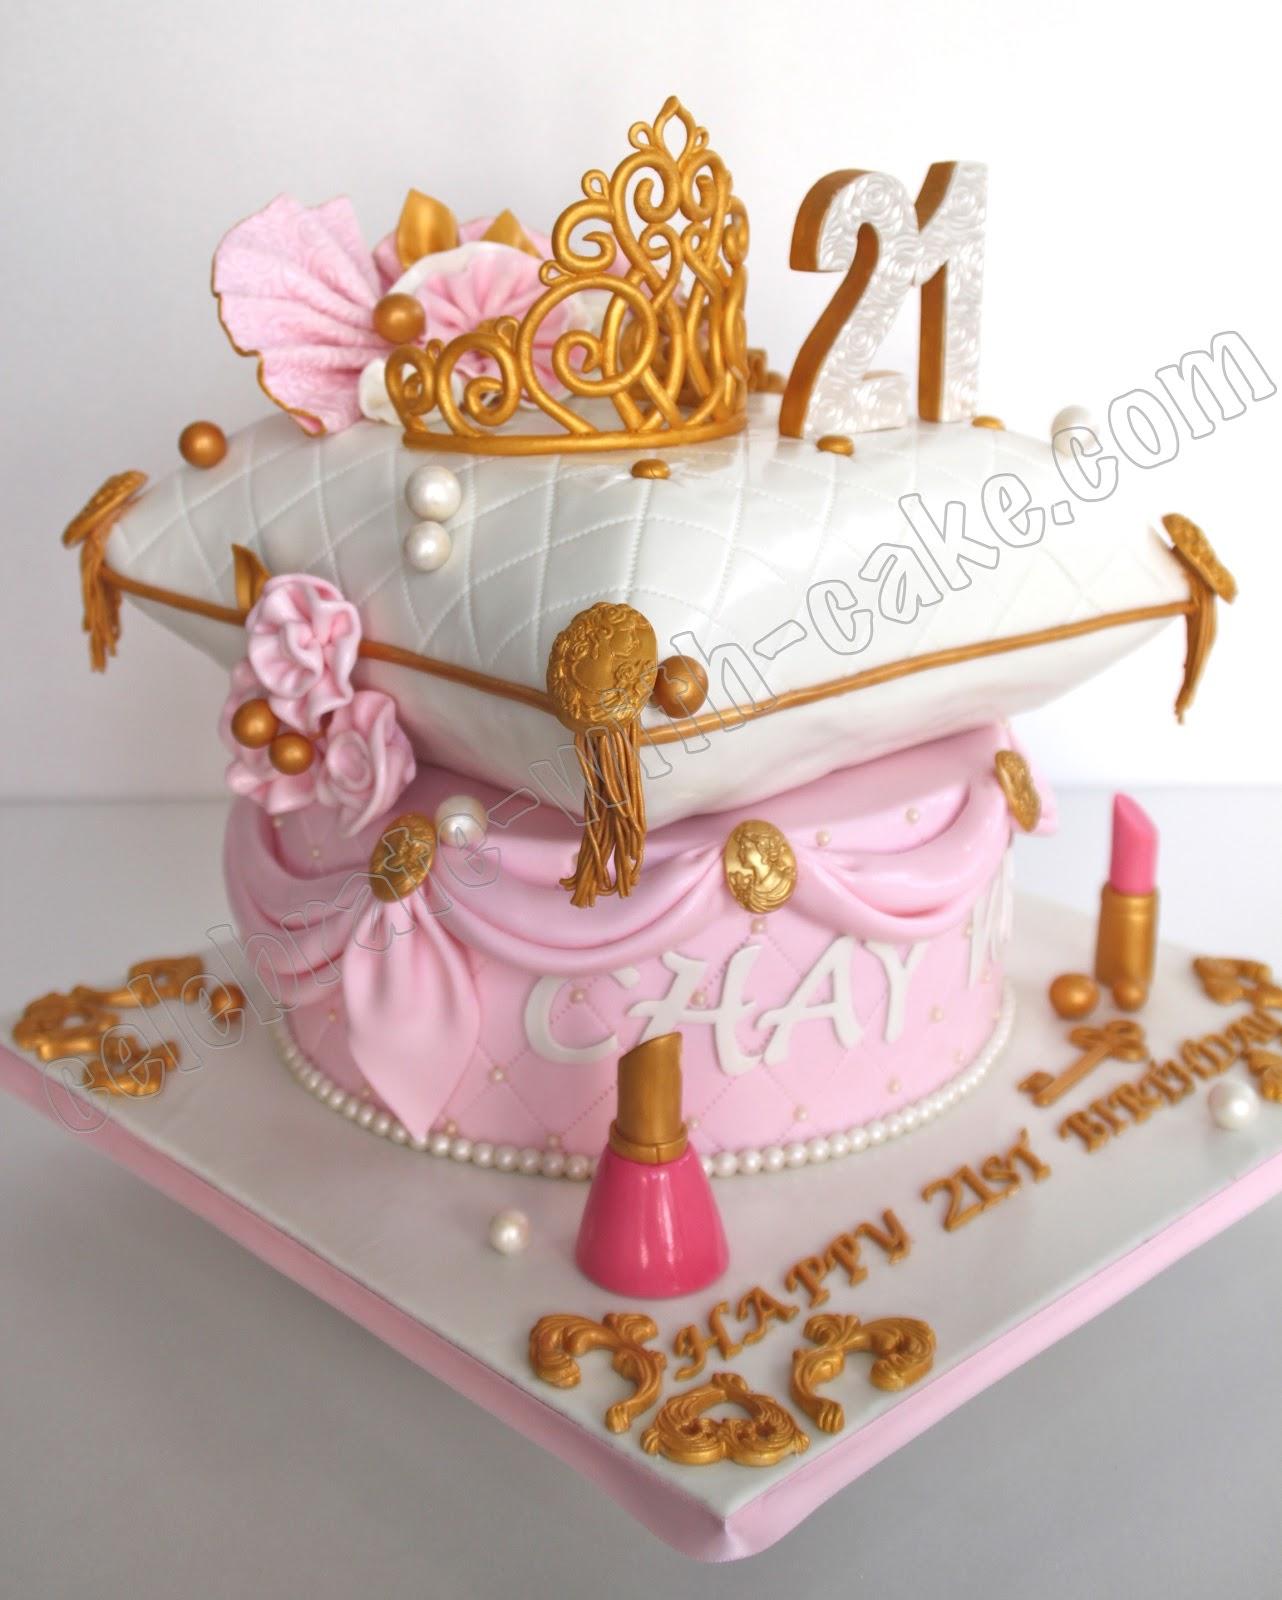 Celebrate With Cake Princess Tiara And Pillow Cake